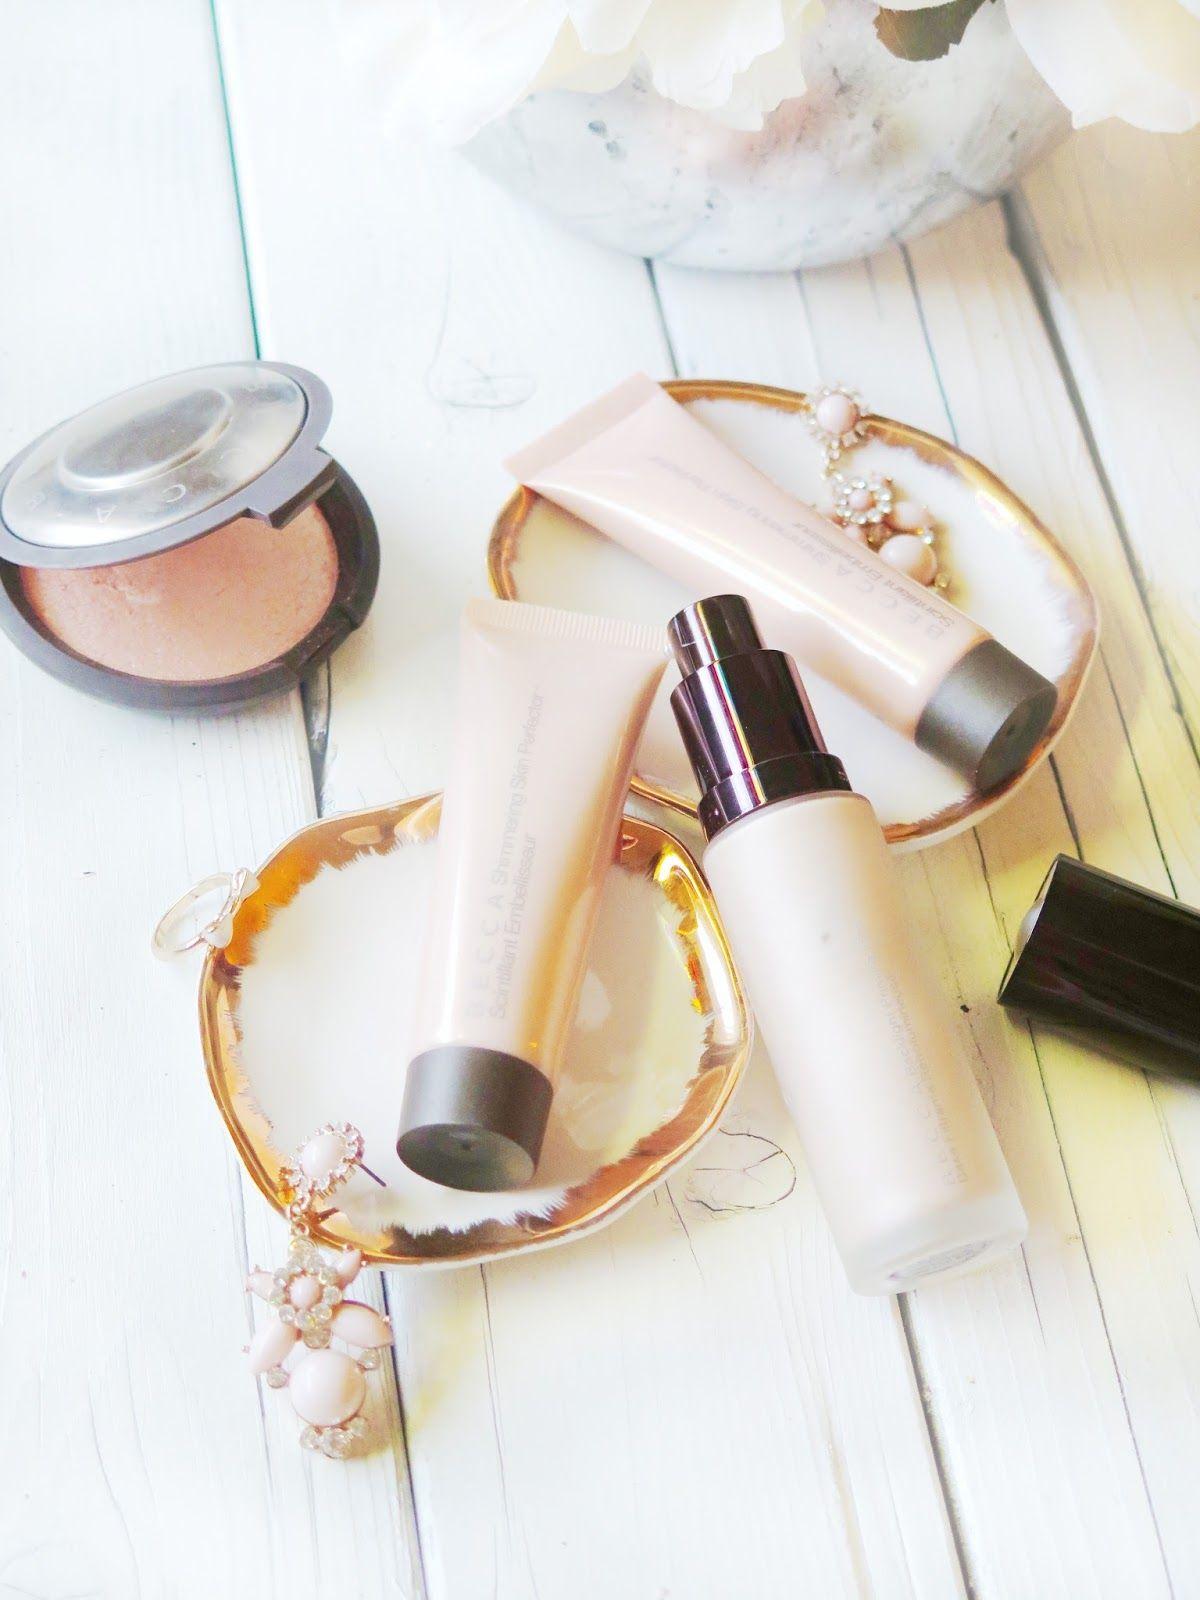 Finding The Light Becca Cosmetics Backlight Luminous